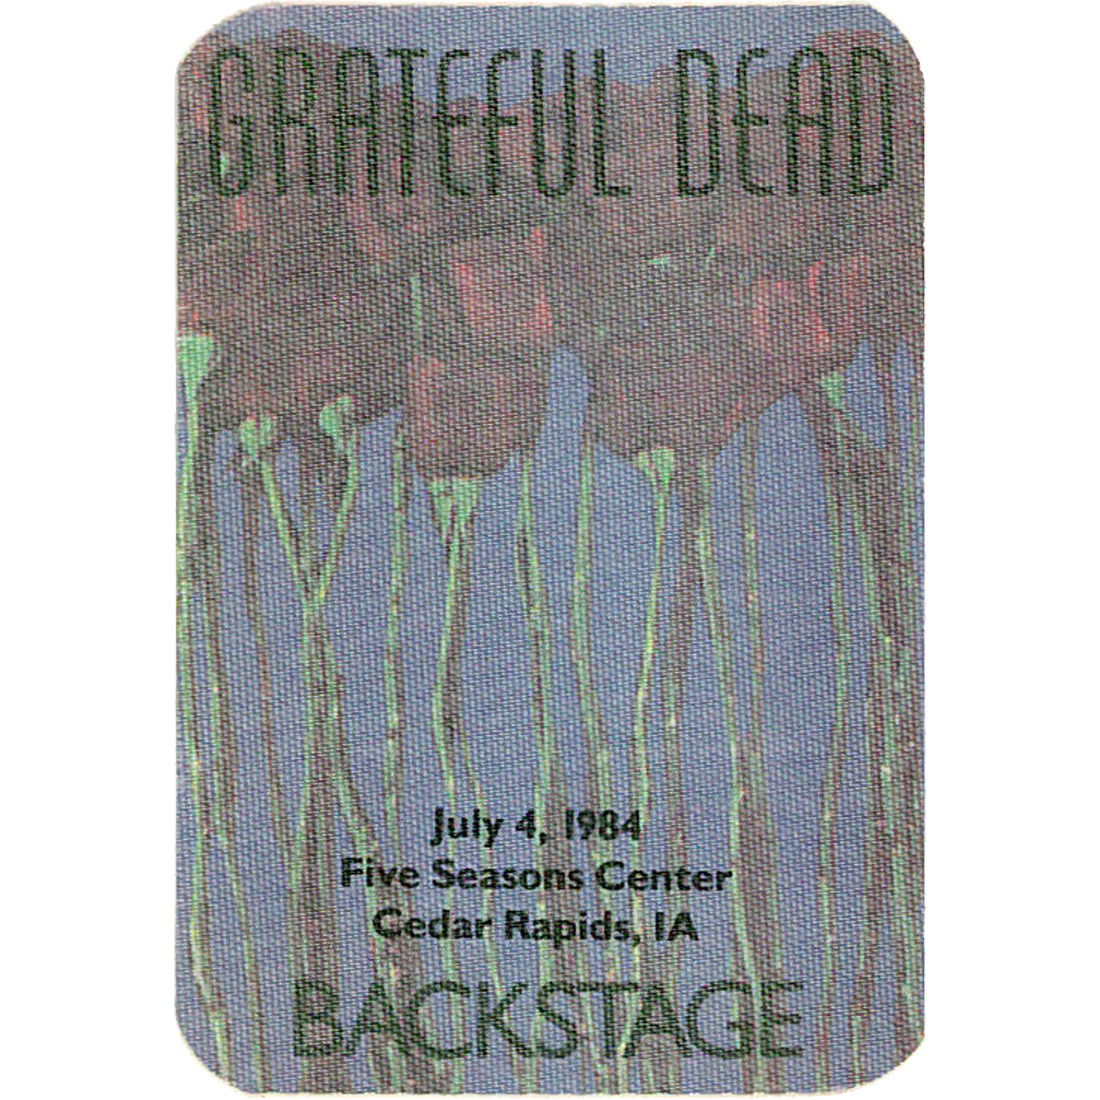 Grateful Dead 1984 07-04 Backstage Pass